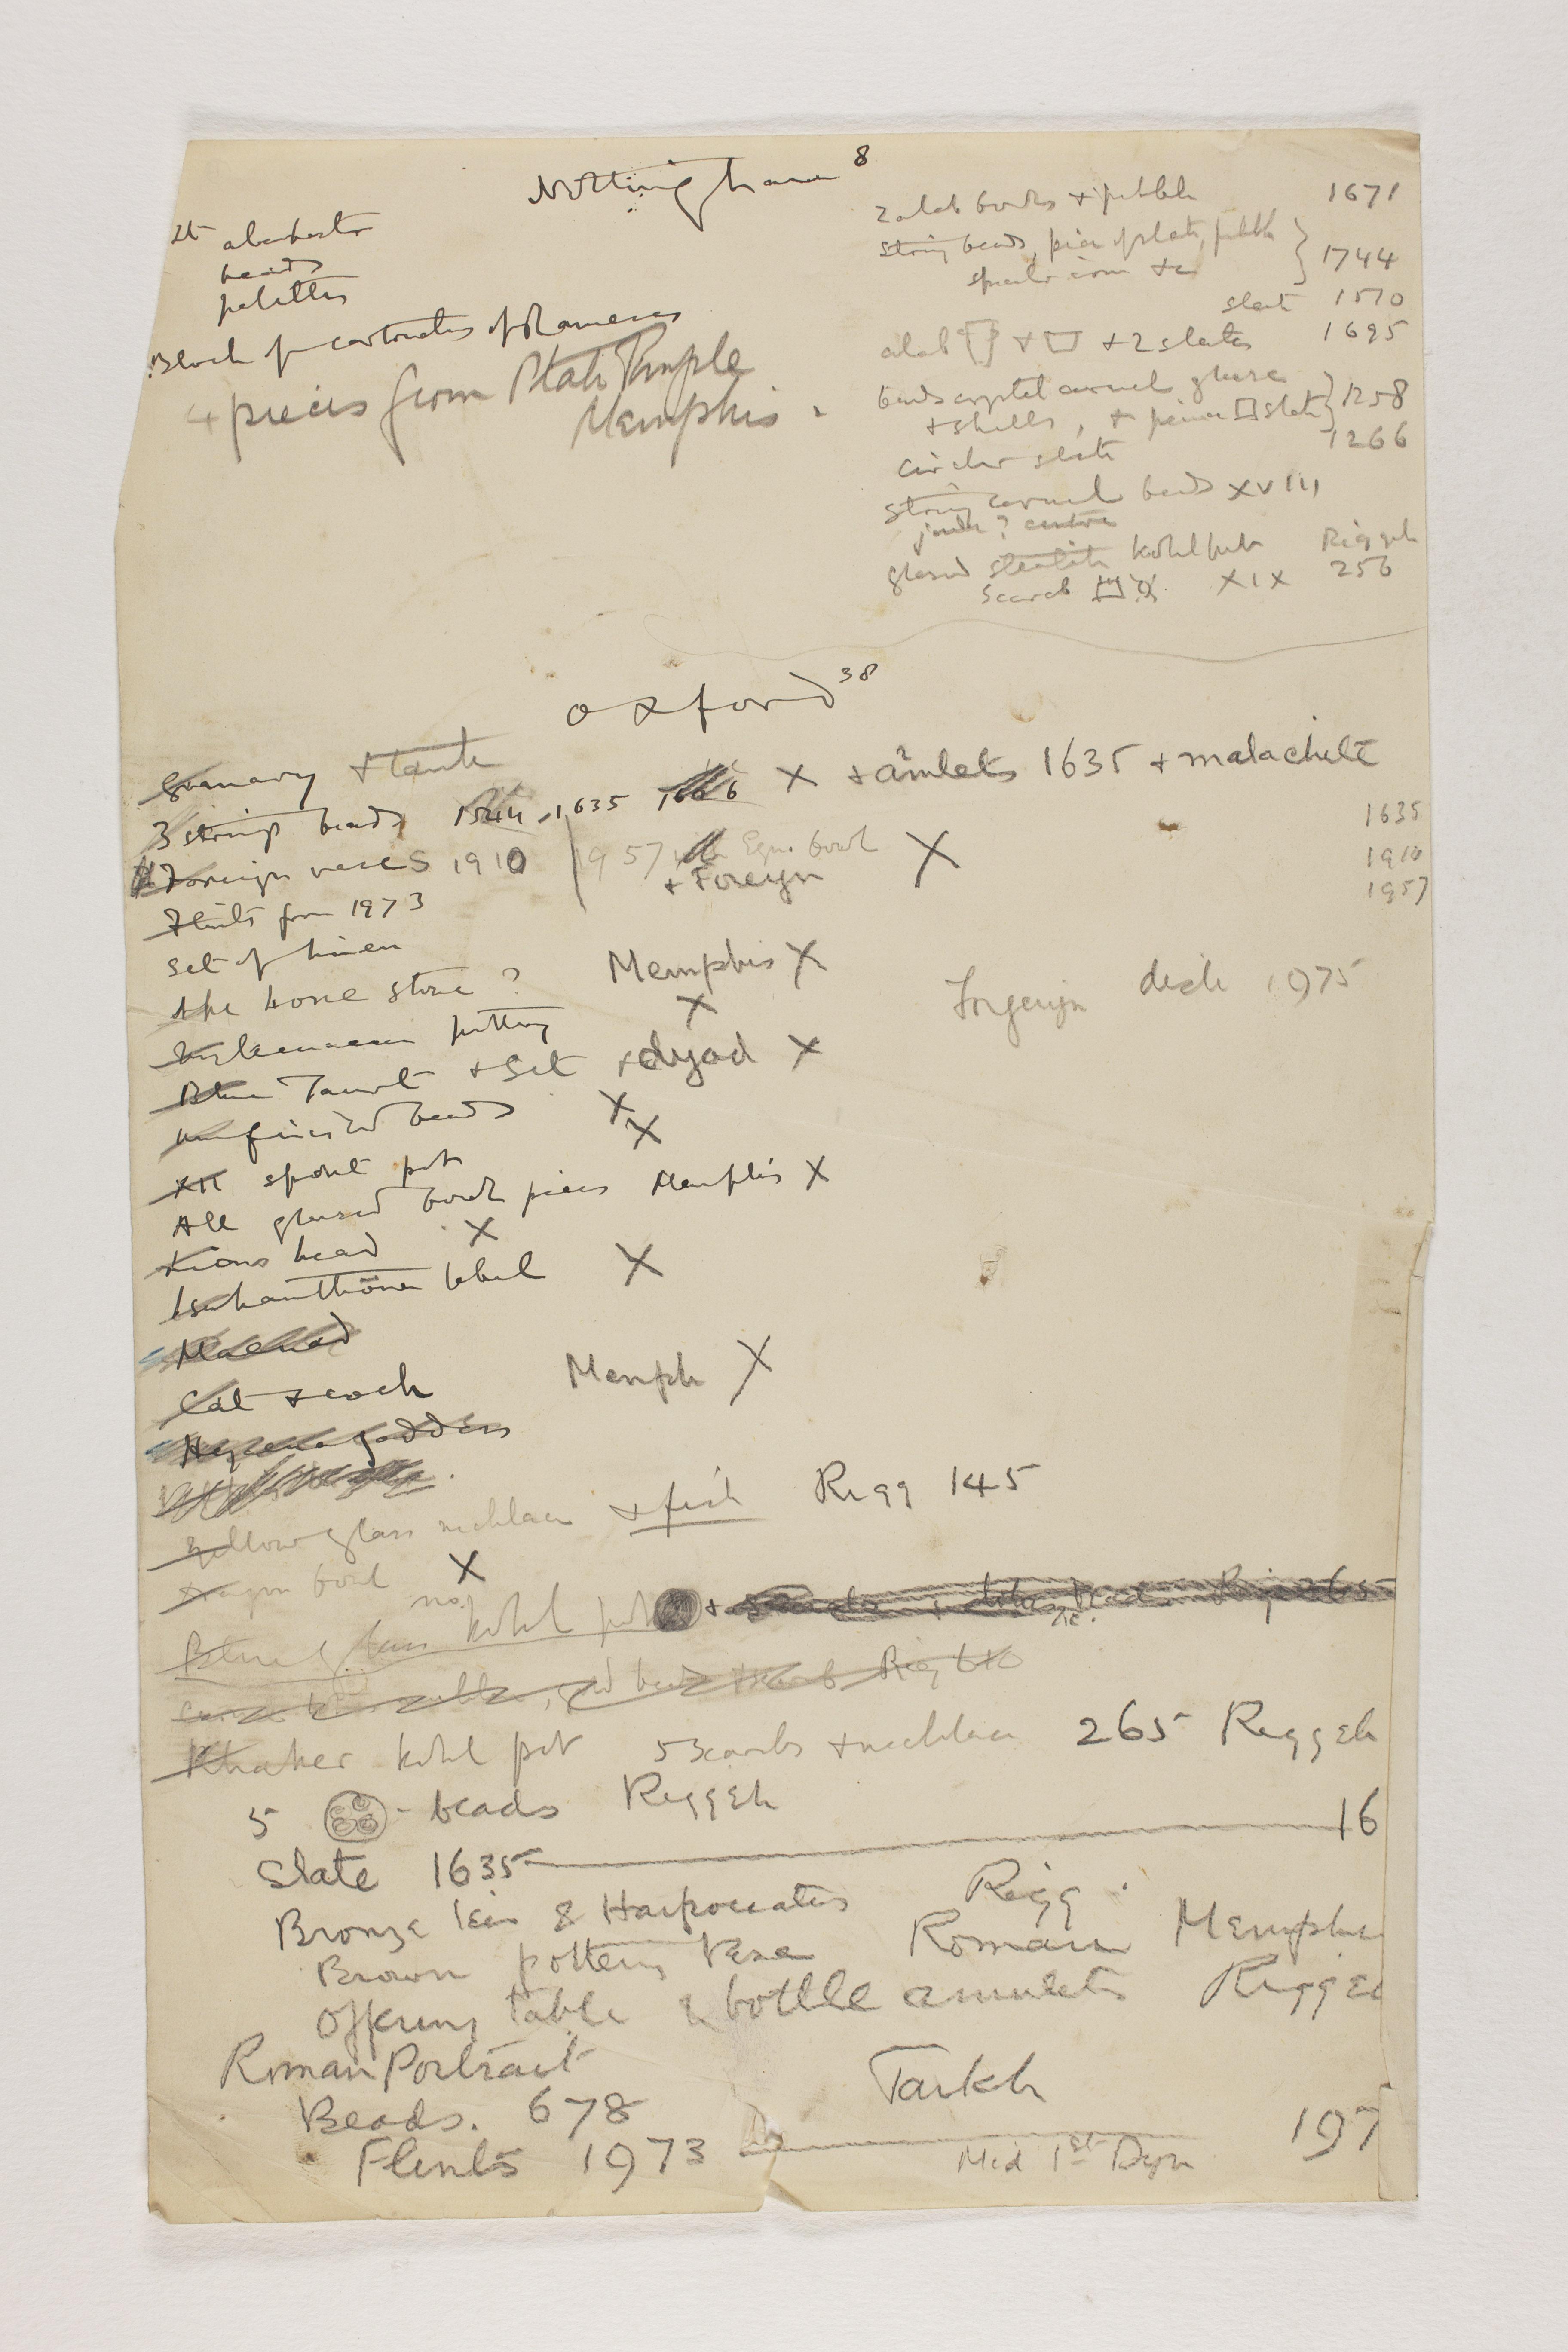 1912-13 Tarkhan, el-Riqqa, Memphis Multiple institution list PMA/WFP1/D/21/13